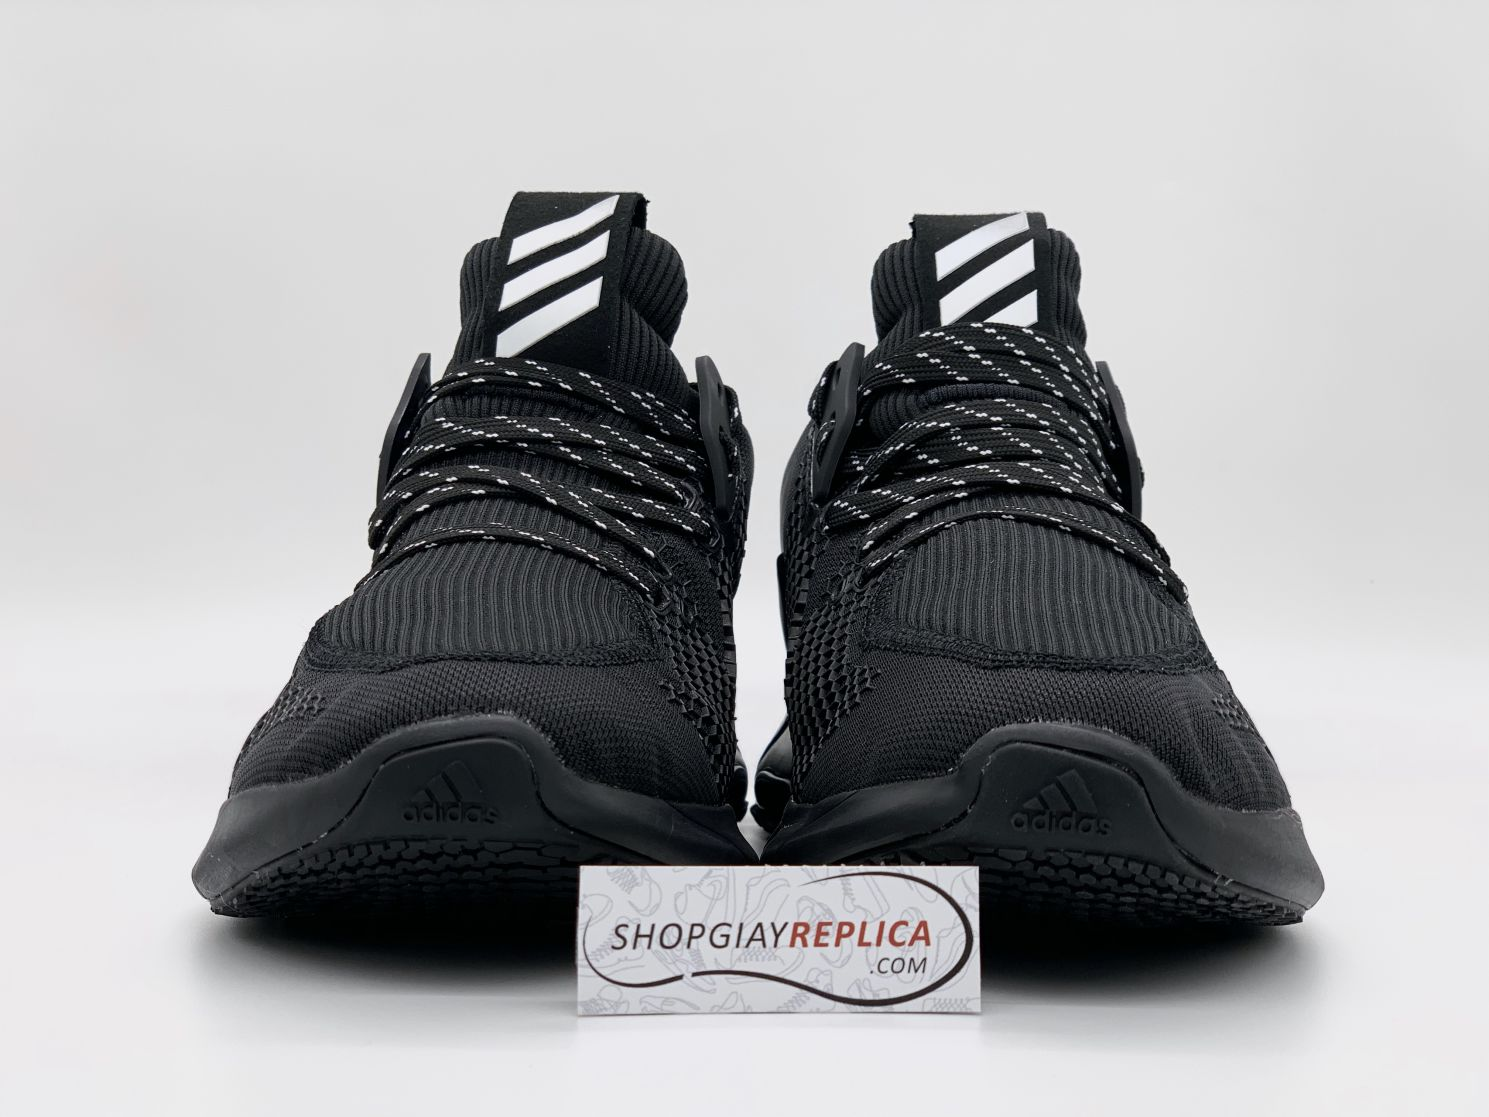 Giày Adidas Alphabounce Instinct M full đen rep 1:1